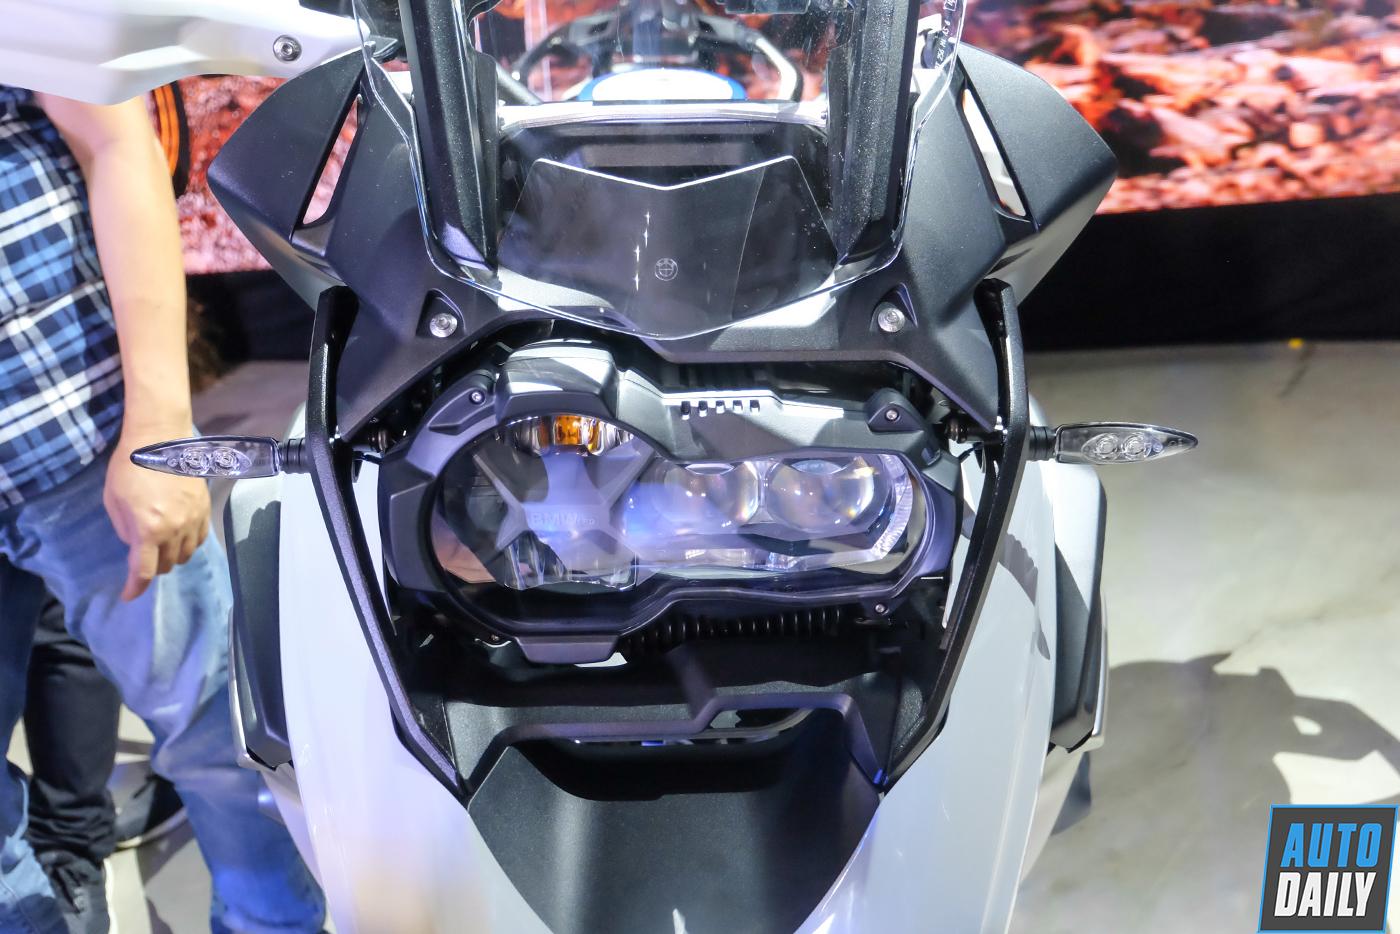 bmw-motorrad-r-1250-gs-2019-10.jpg